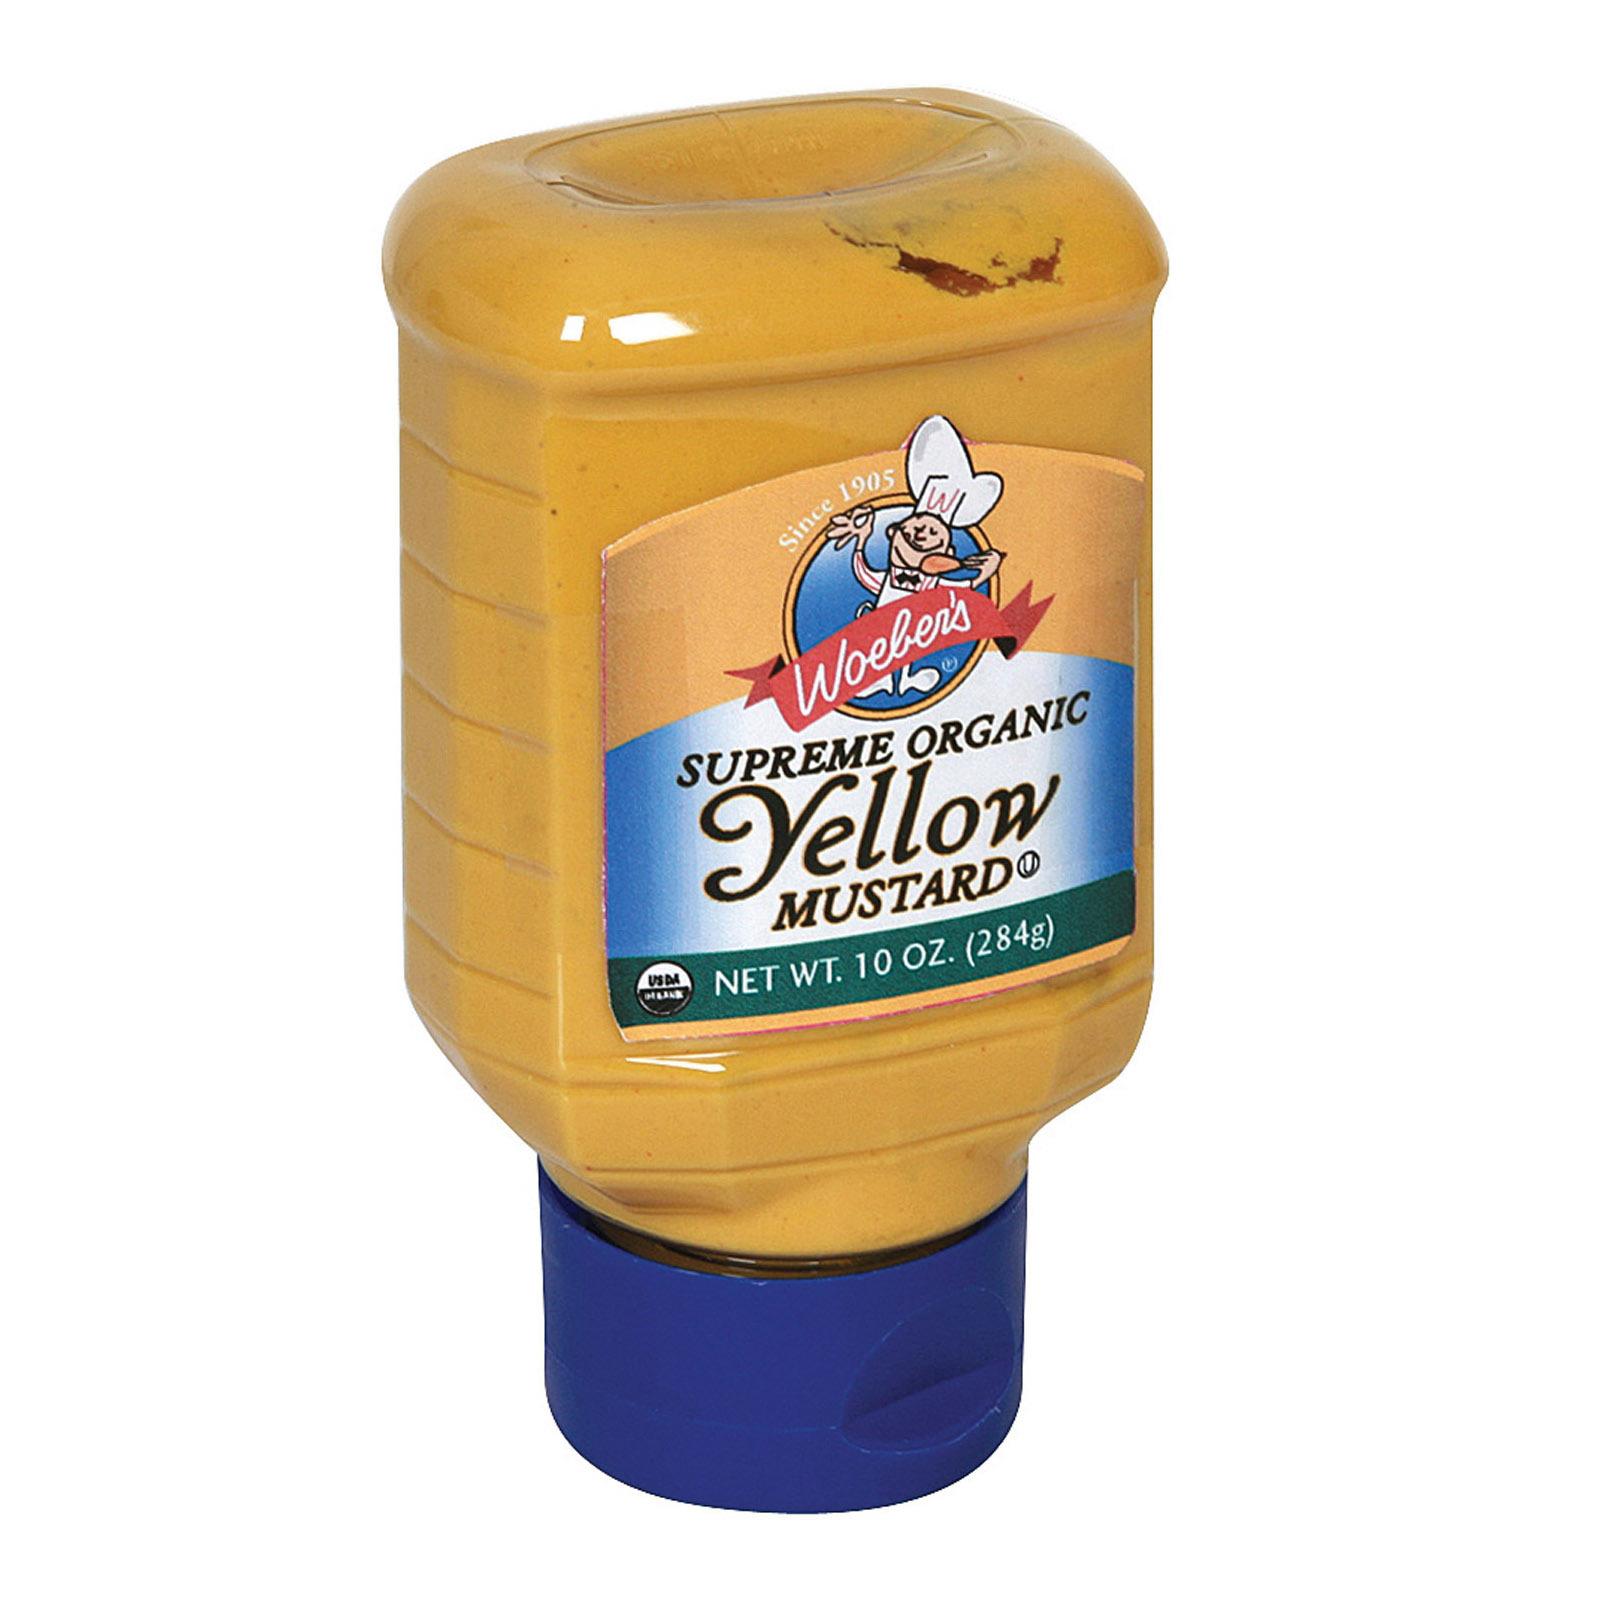 Woeber's Organic Mustard - Yellow - Case of 6 - 10 oz